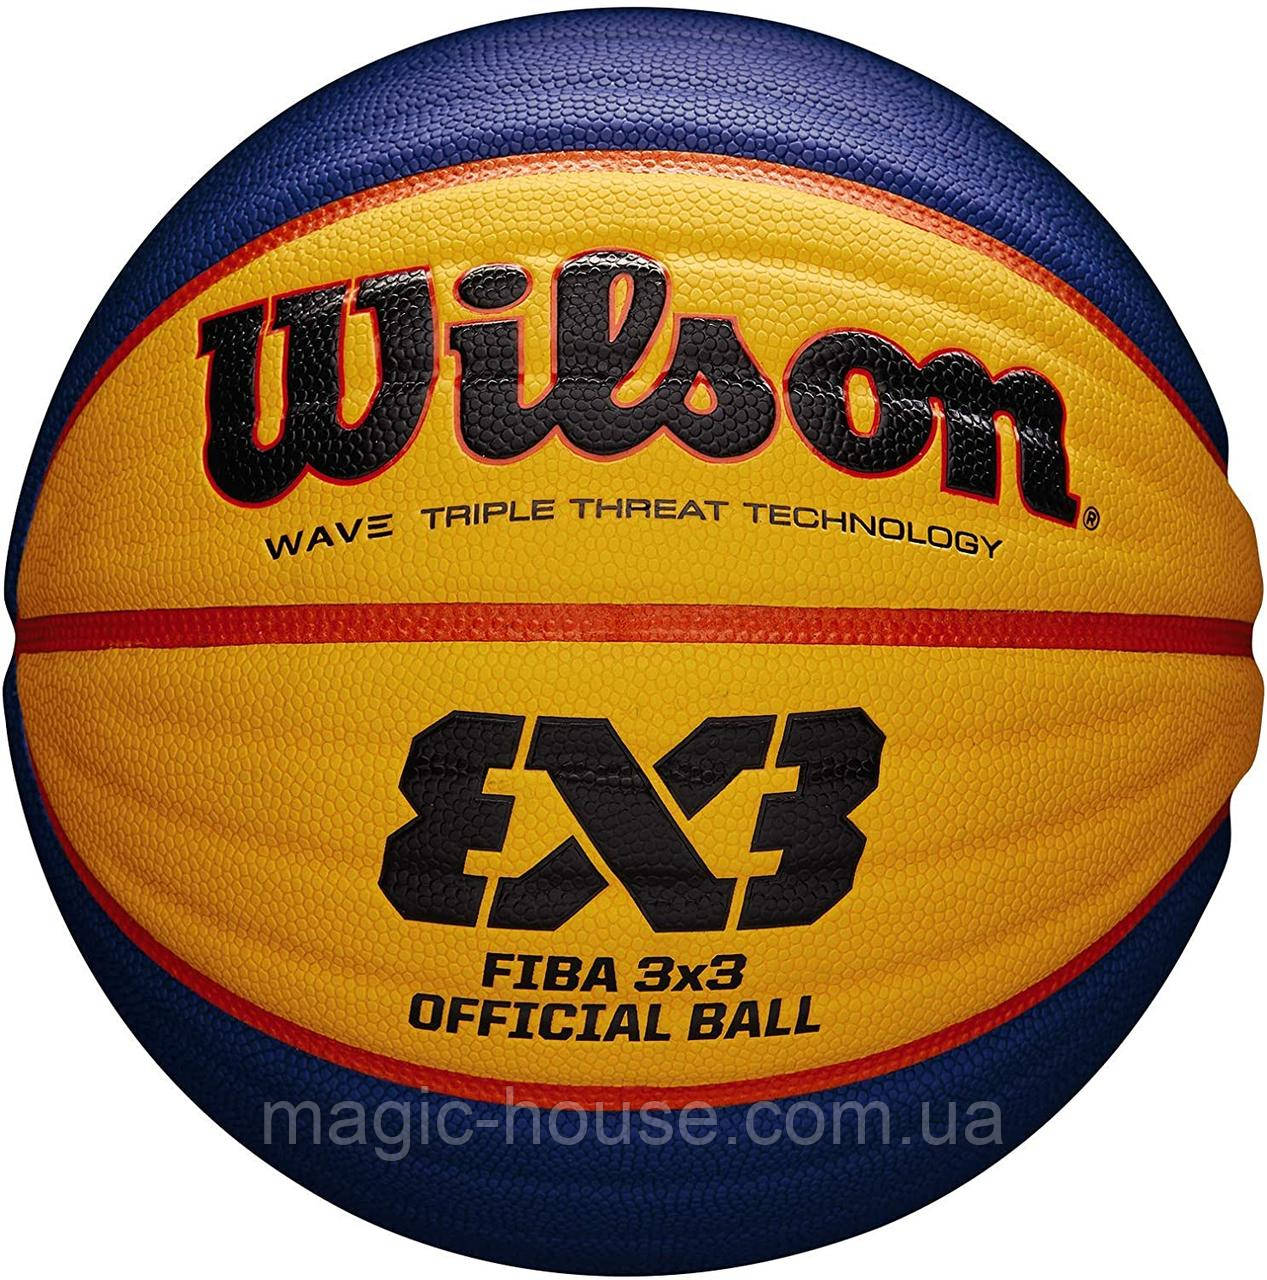 Wilson FIBA 3x3 Official Game Basketball М'яч вілсон баскетбольний розмір 6 ОРИГІНАЛ